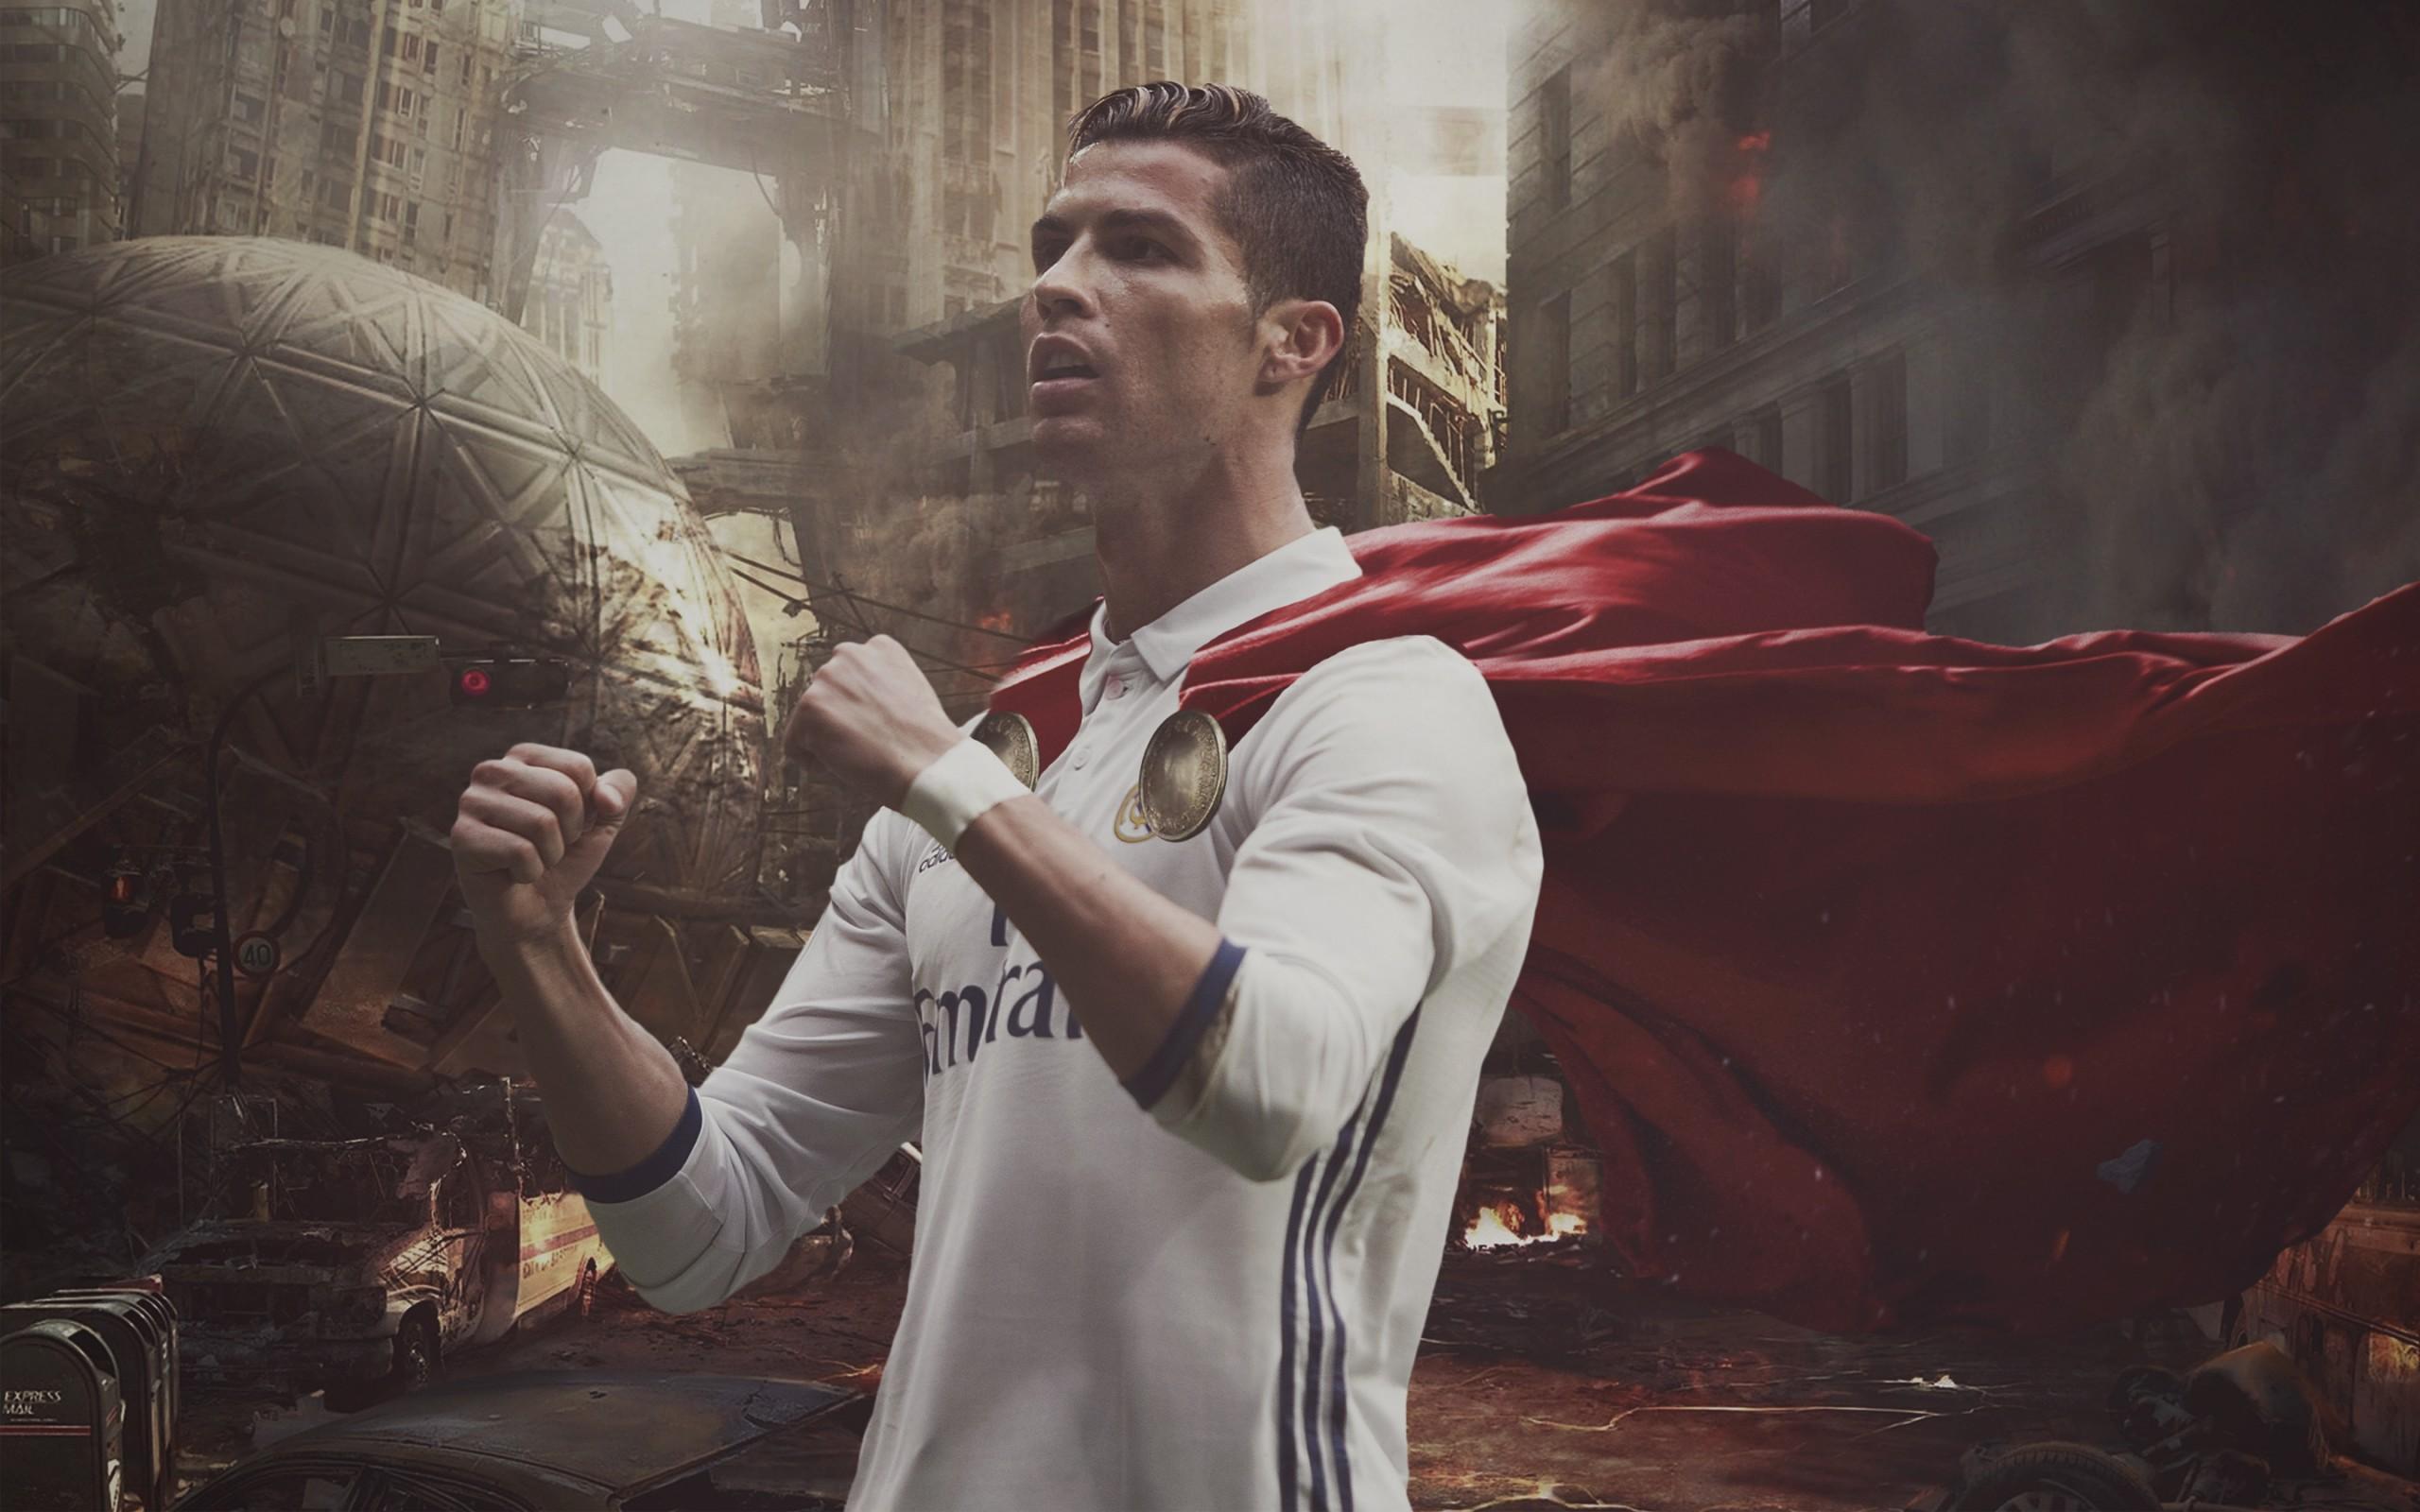 Cr7 Wallpaper Iphone X Cristiano Ronaldo 4k 2017 Wallpapers Hd Wallpapers Id